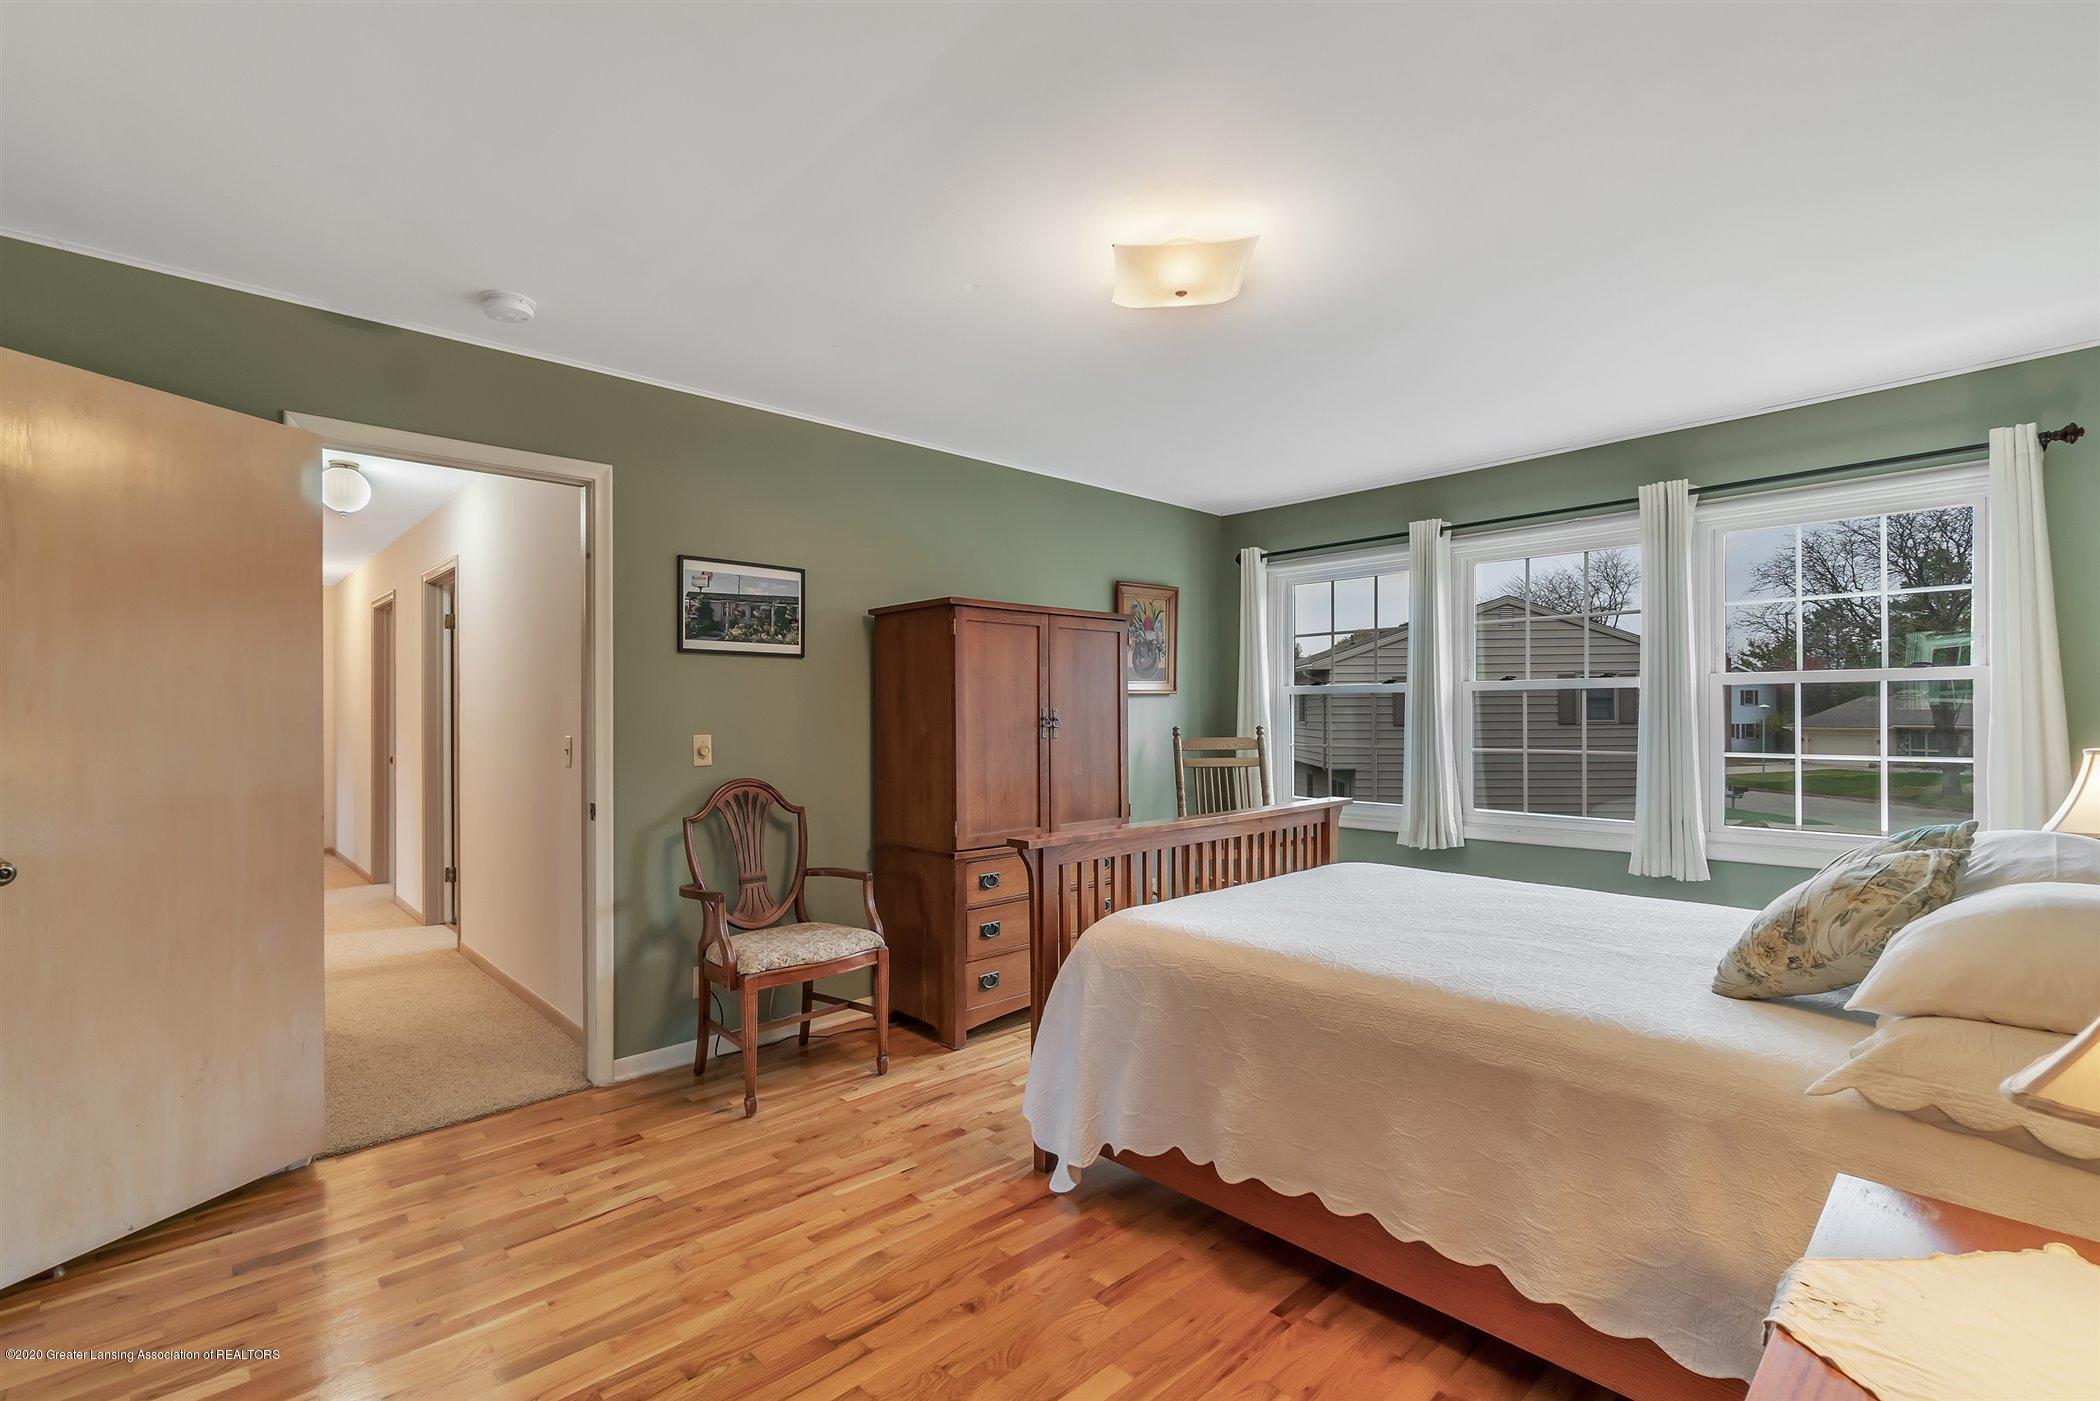 2098 Butternut Dr - primary bedroom - 24